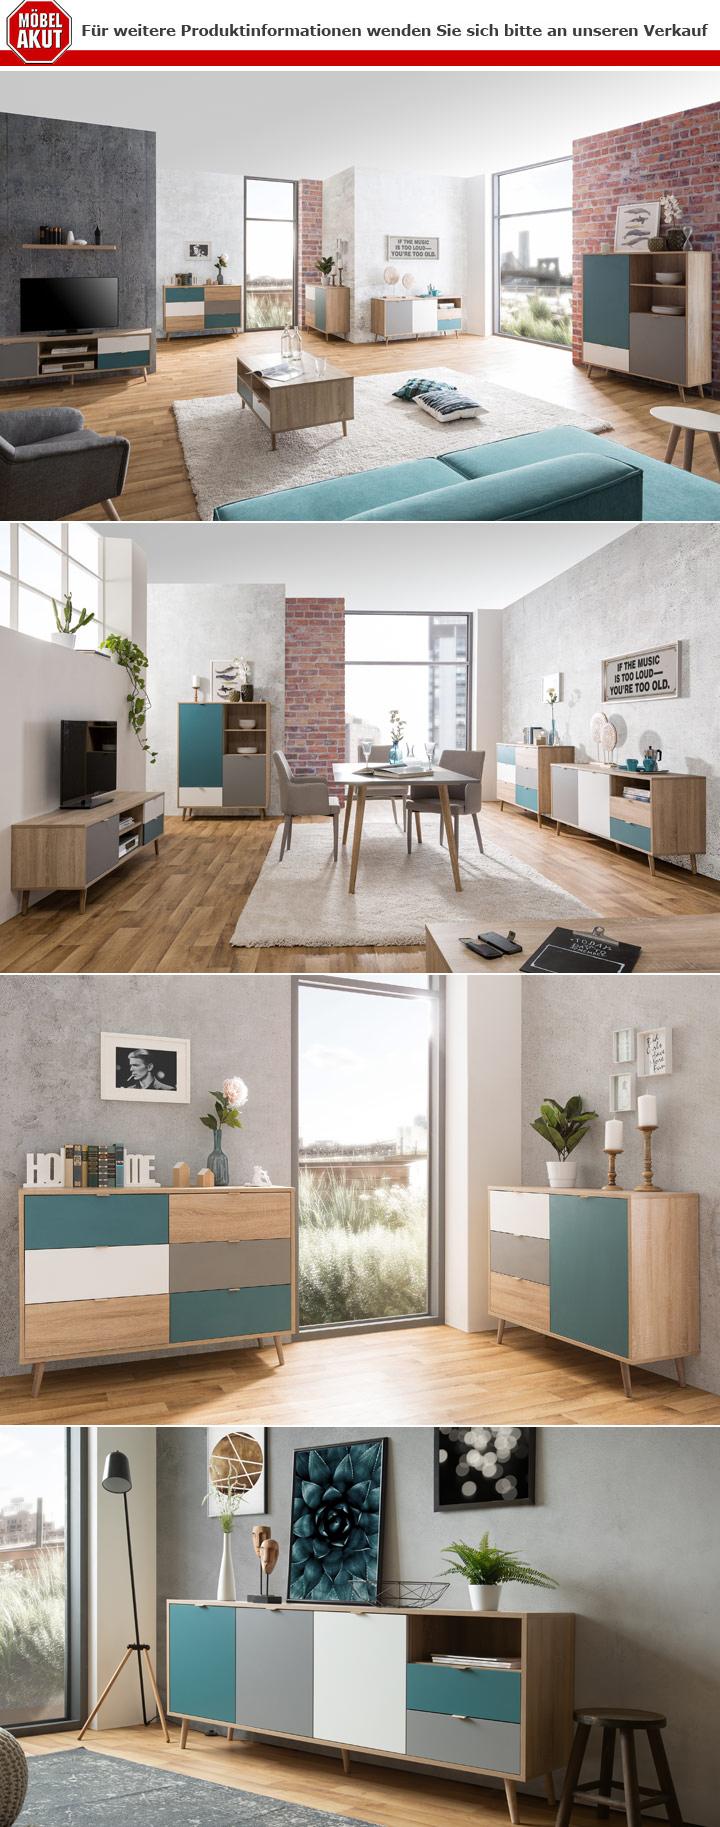 sideboard cuba kommode anrichte sonoma eiche wei grau. Black Bedroom Furniture Sets. Home Design Ideas